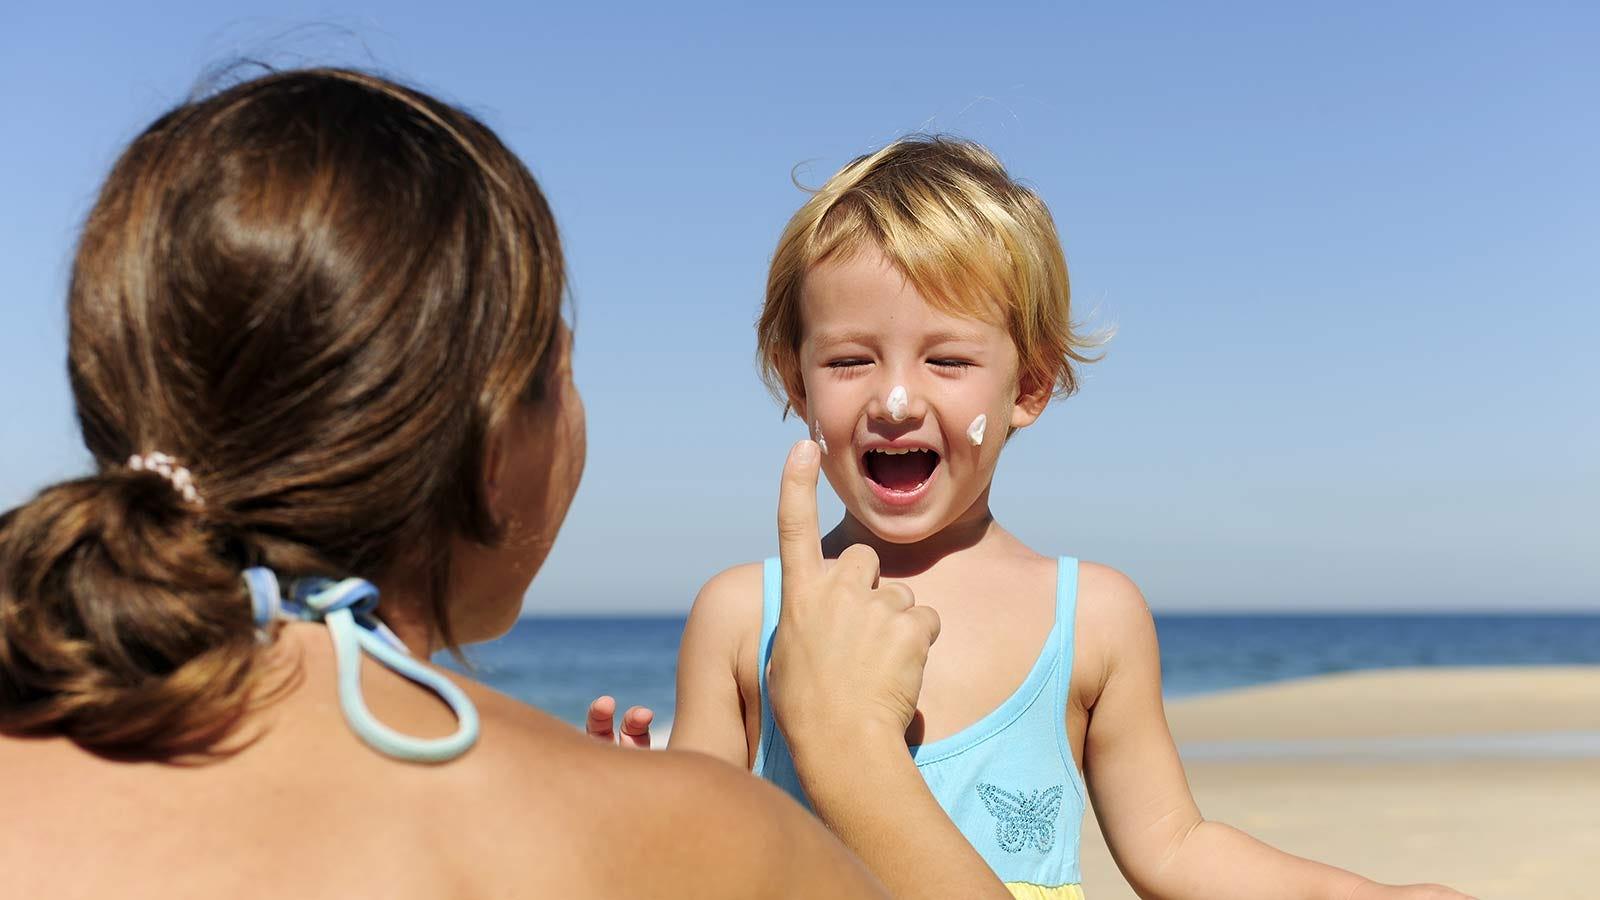 A woman applying sunscreen to a little girl's face.